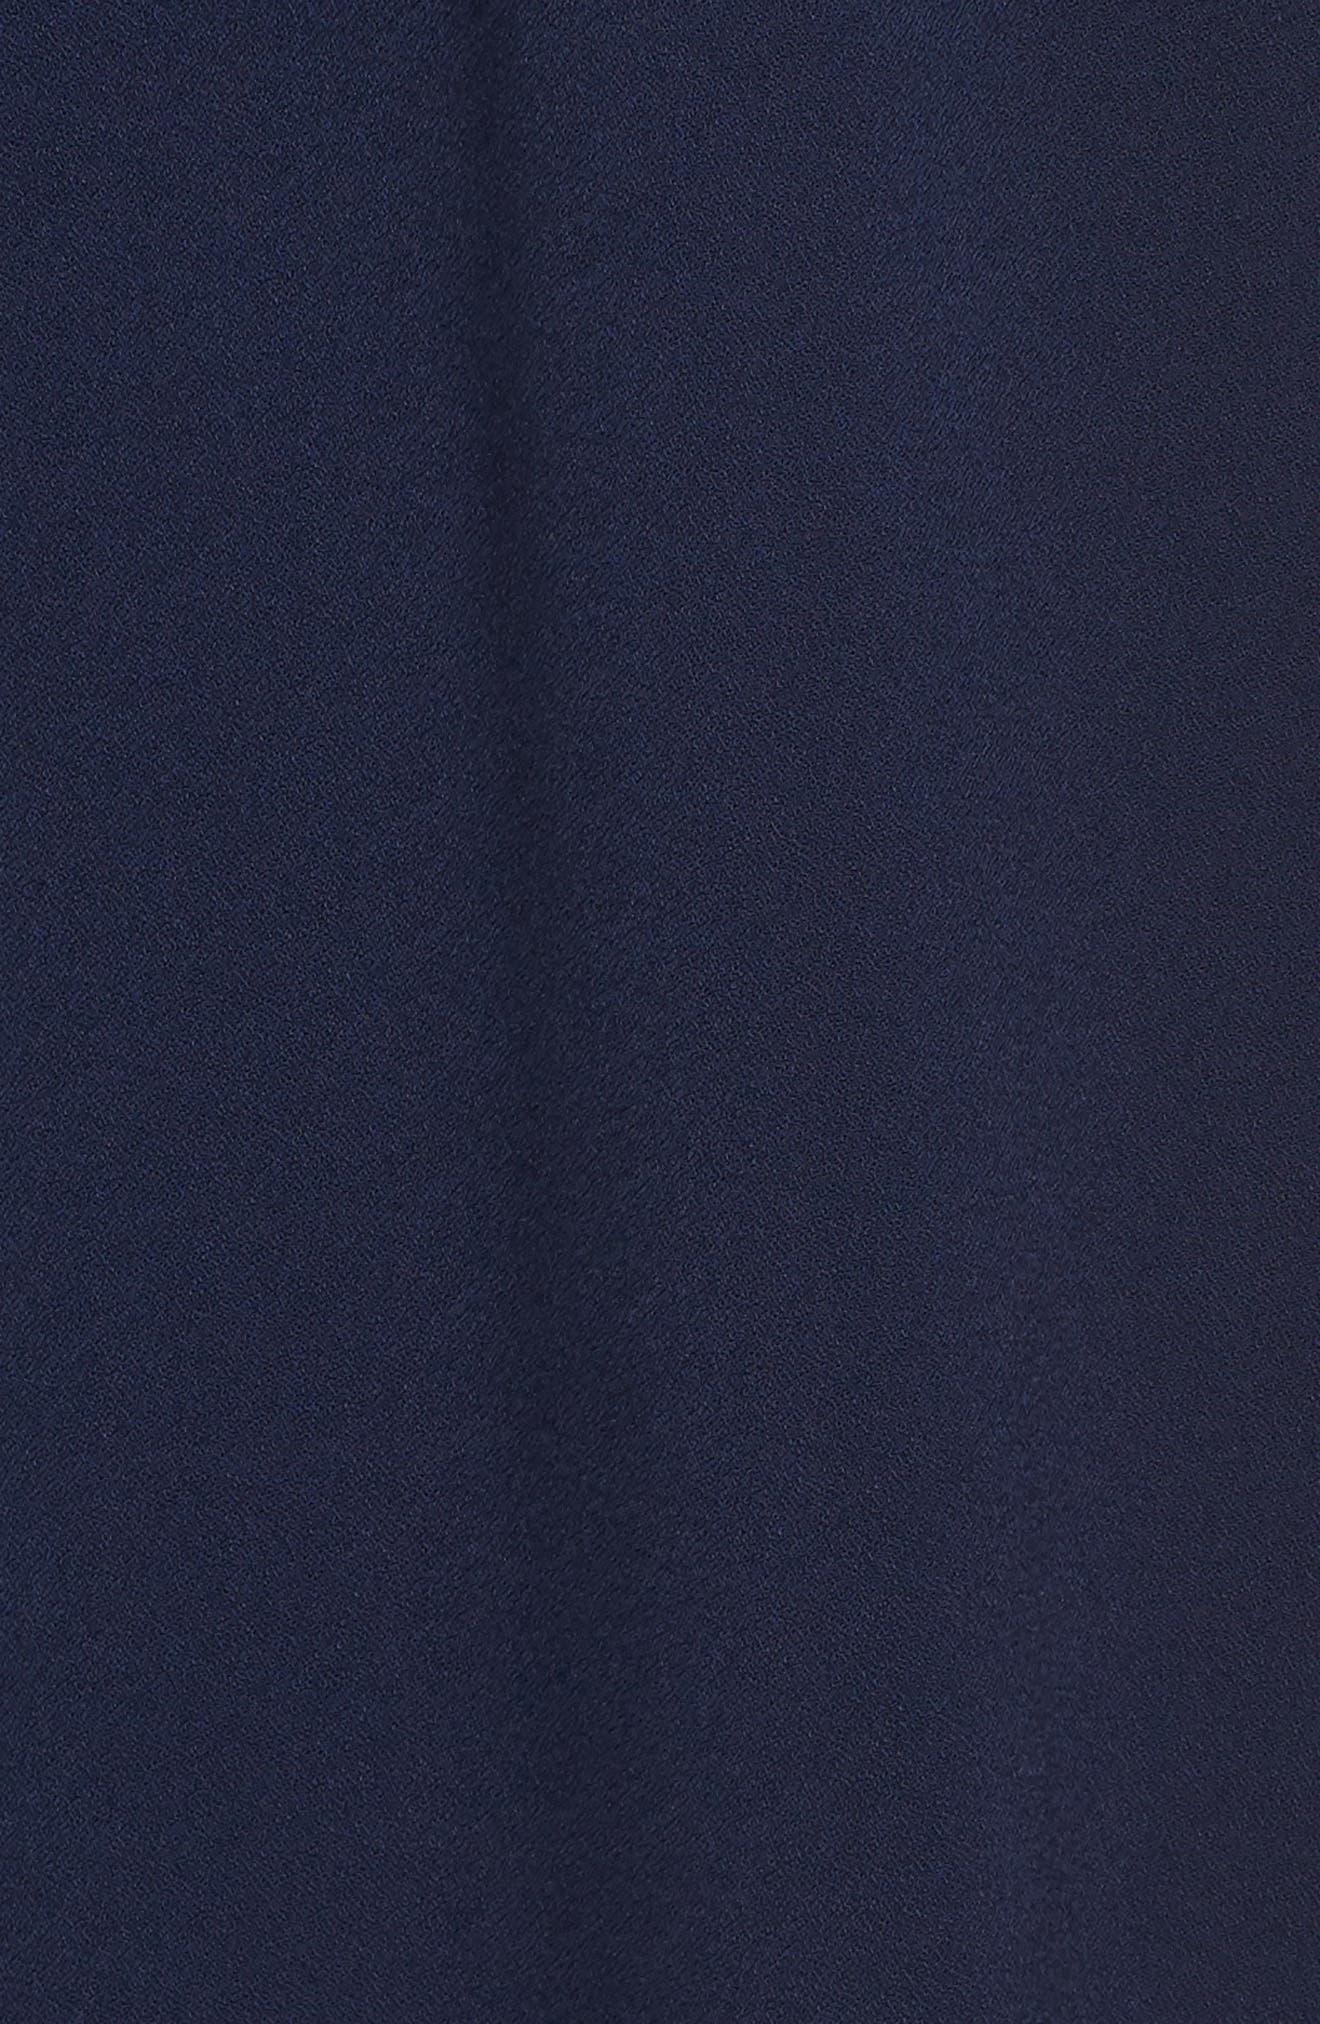 Gracelynn Tunic Dress,                             Alternate thumbnail 5, color,                             408